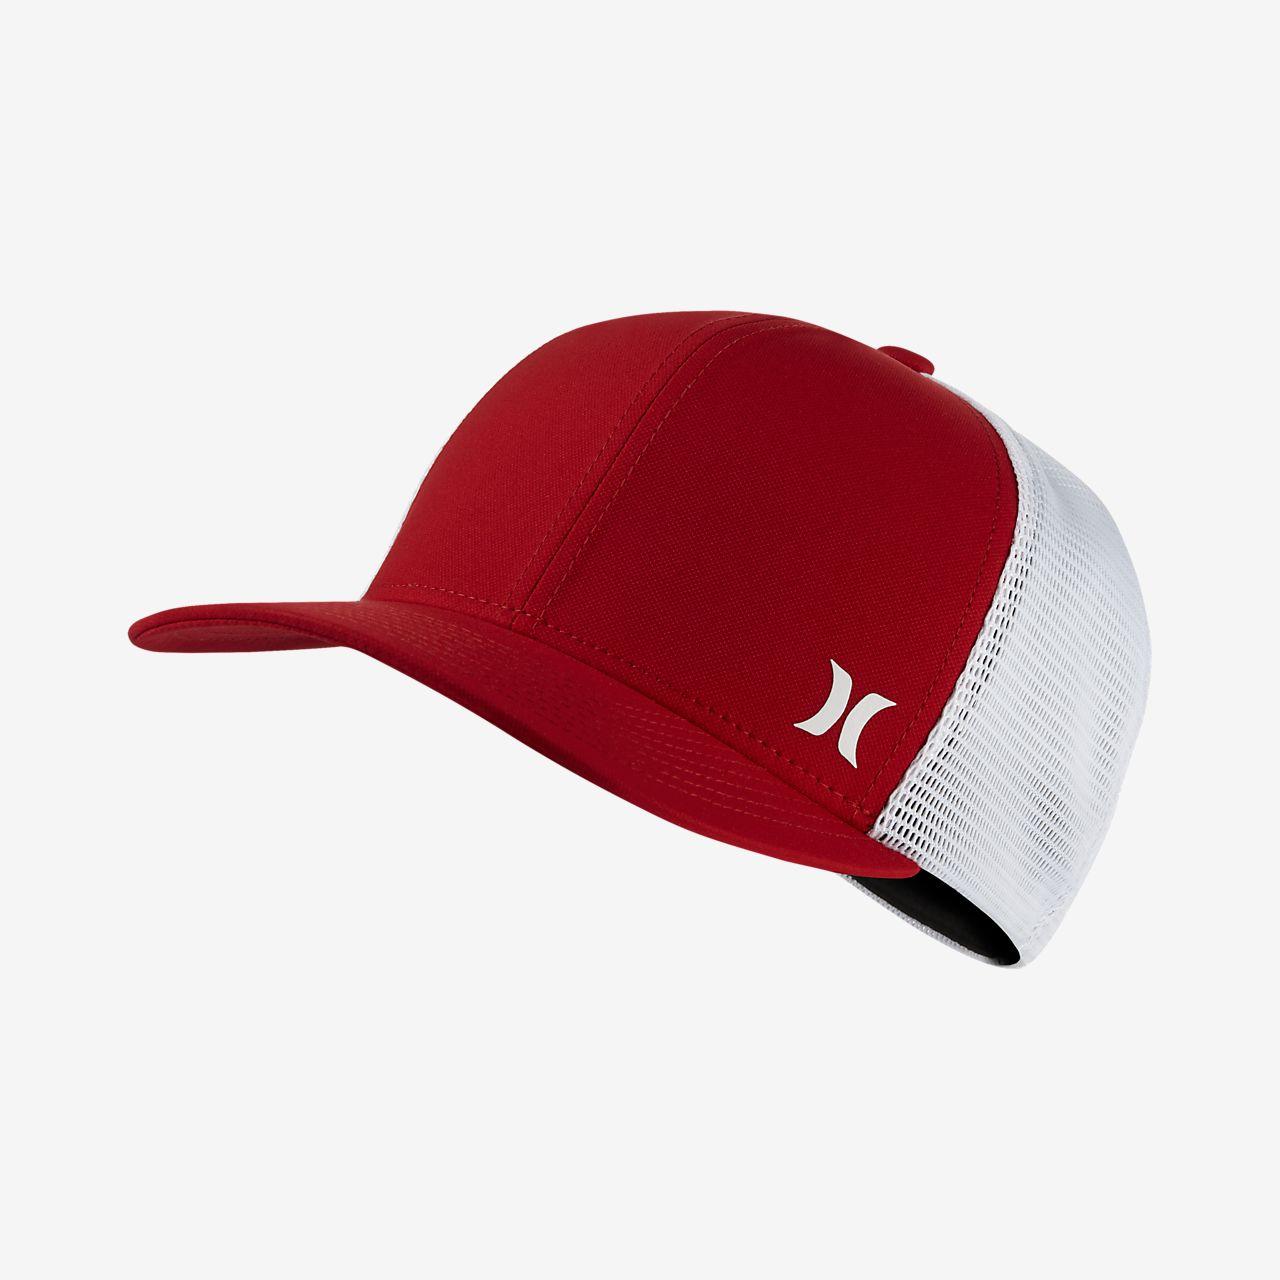 online retailer 158e7 7f188 new zealand hurley blocked trucker hat red white f5e14 80658  uk hurley  milner trucker unisex adjustable hat a2a34 d42db